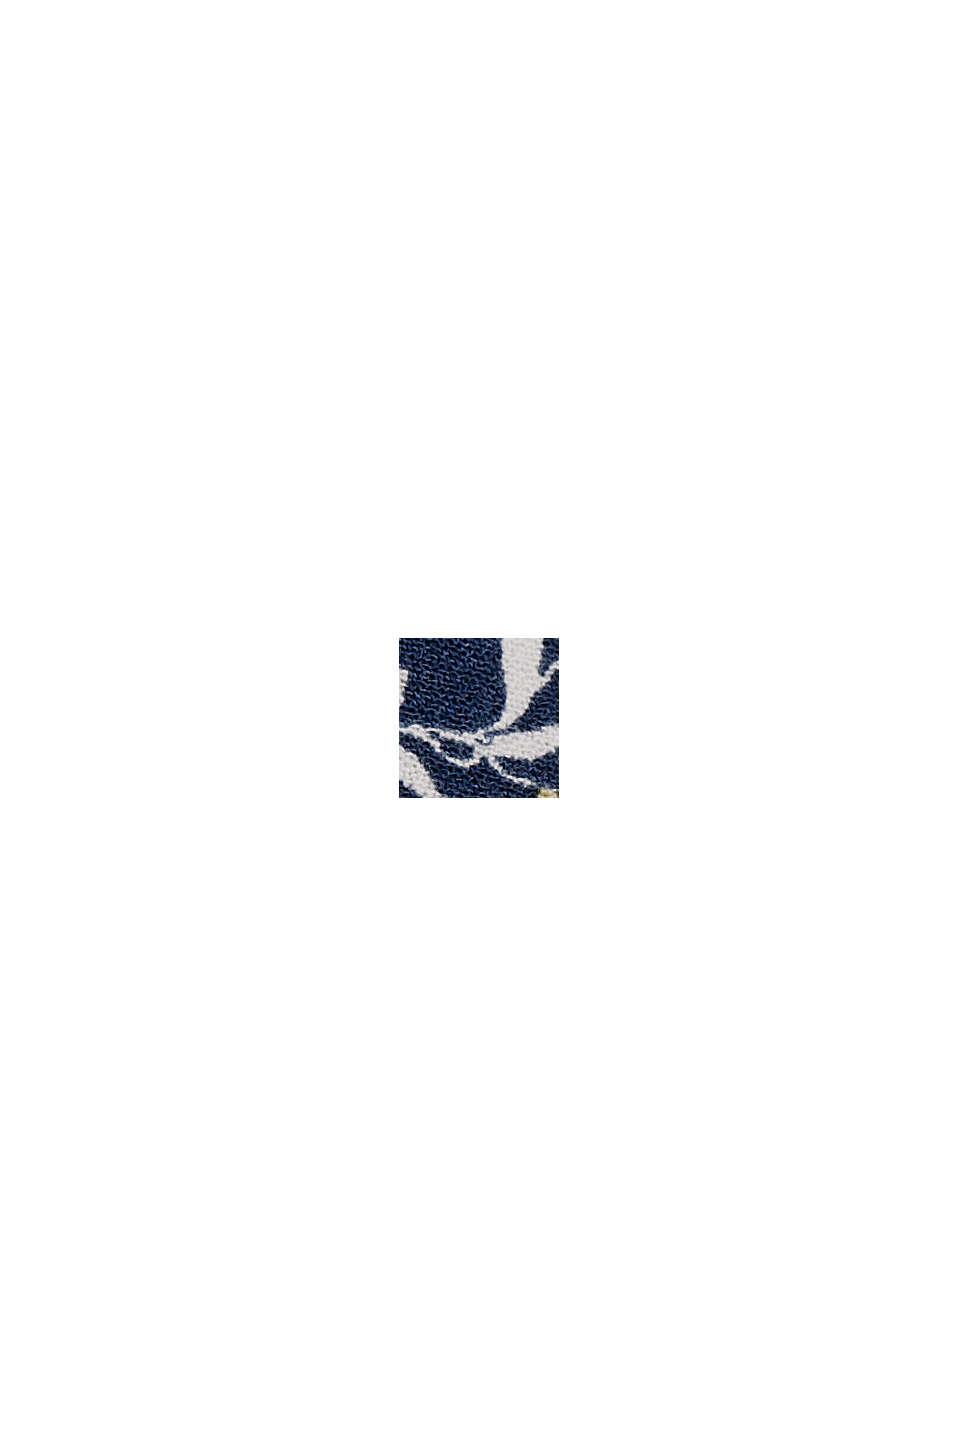 CURVY Blusa con stampa floreale, NAVY, swatch